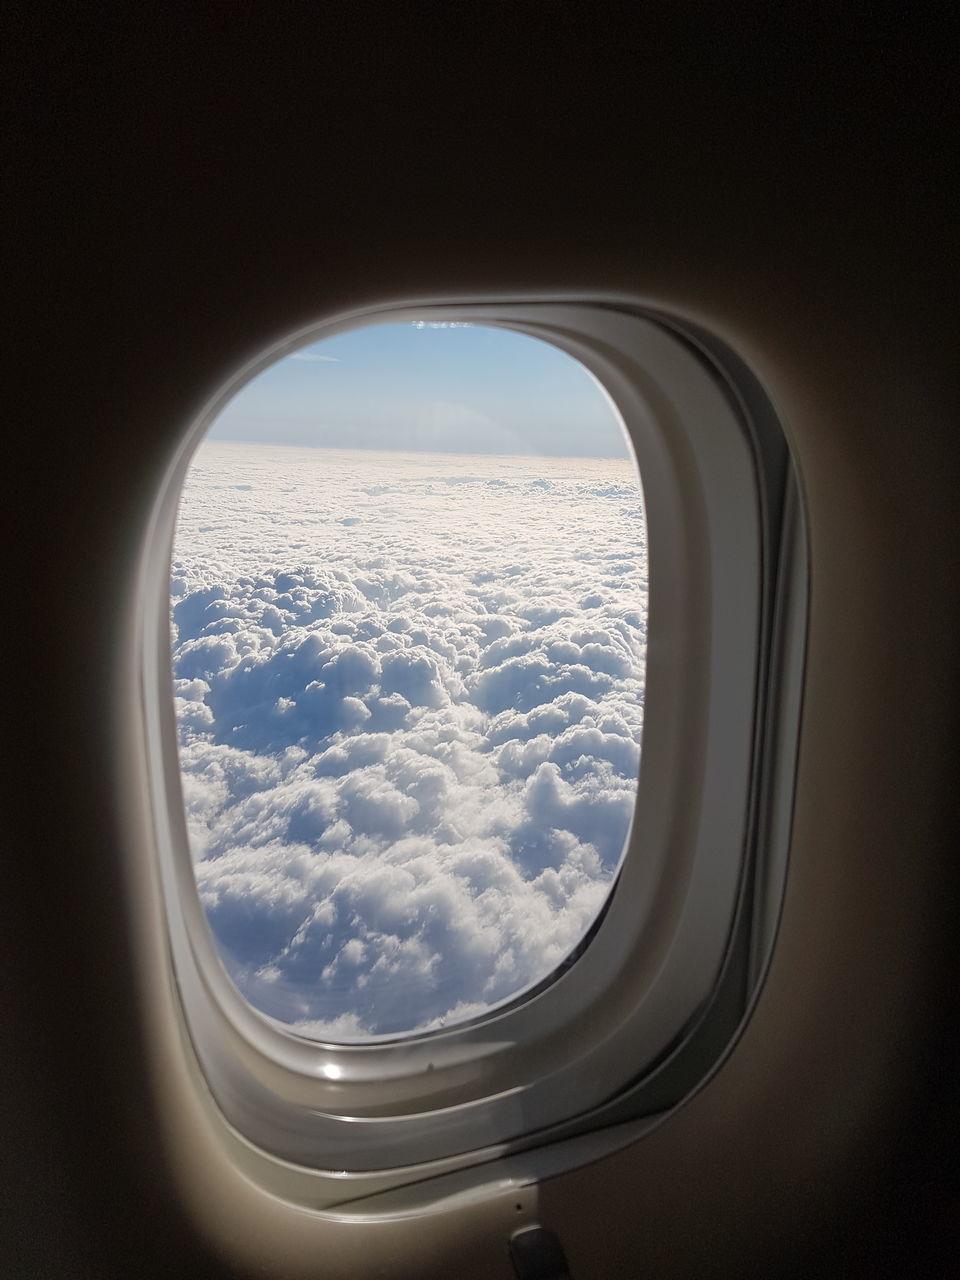 SEASCAPE SEEN THROUGH AIRPLANE WINDOW